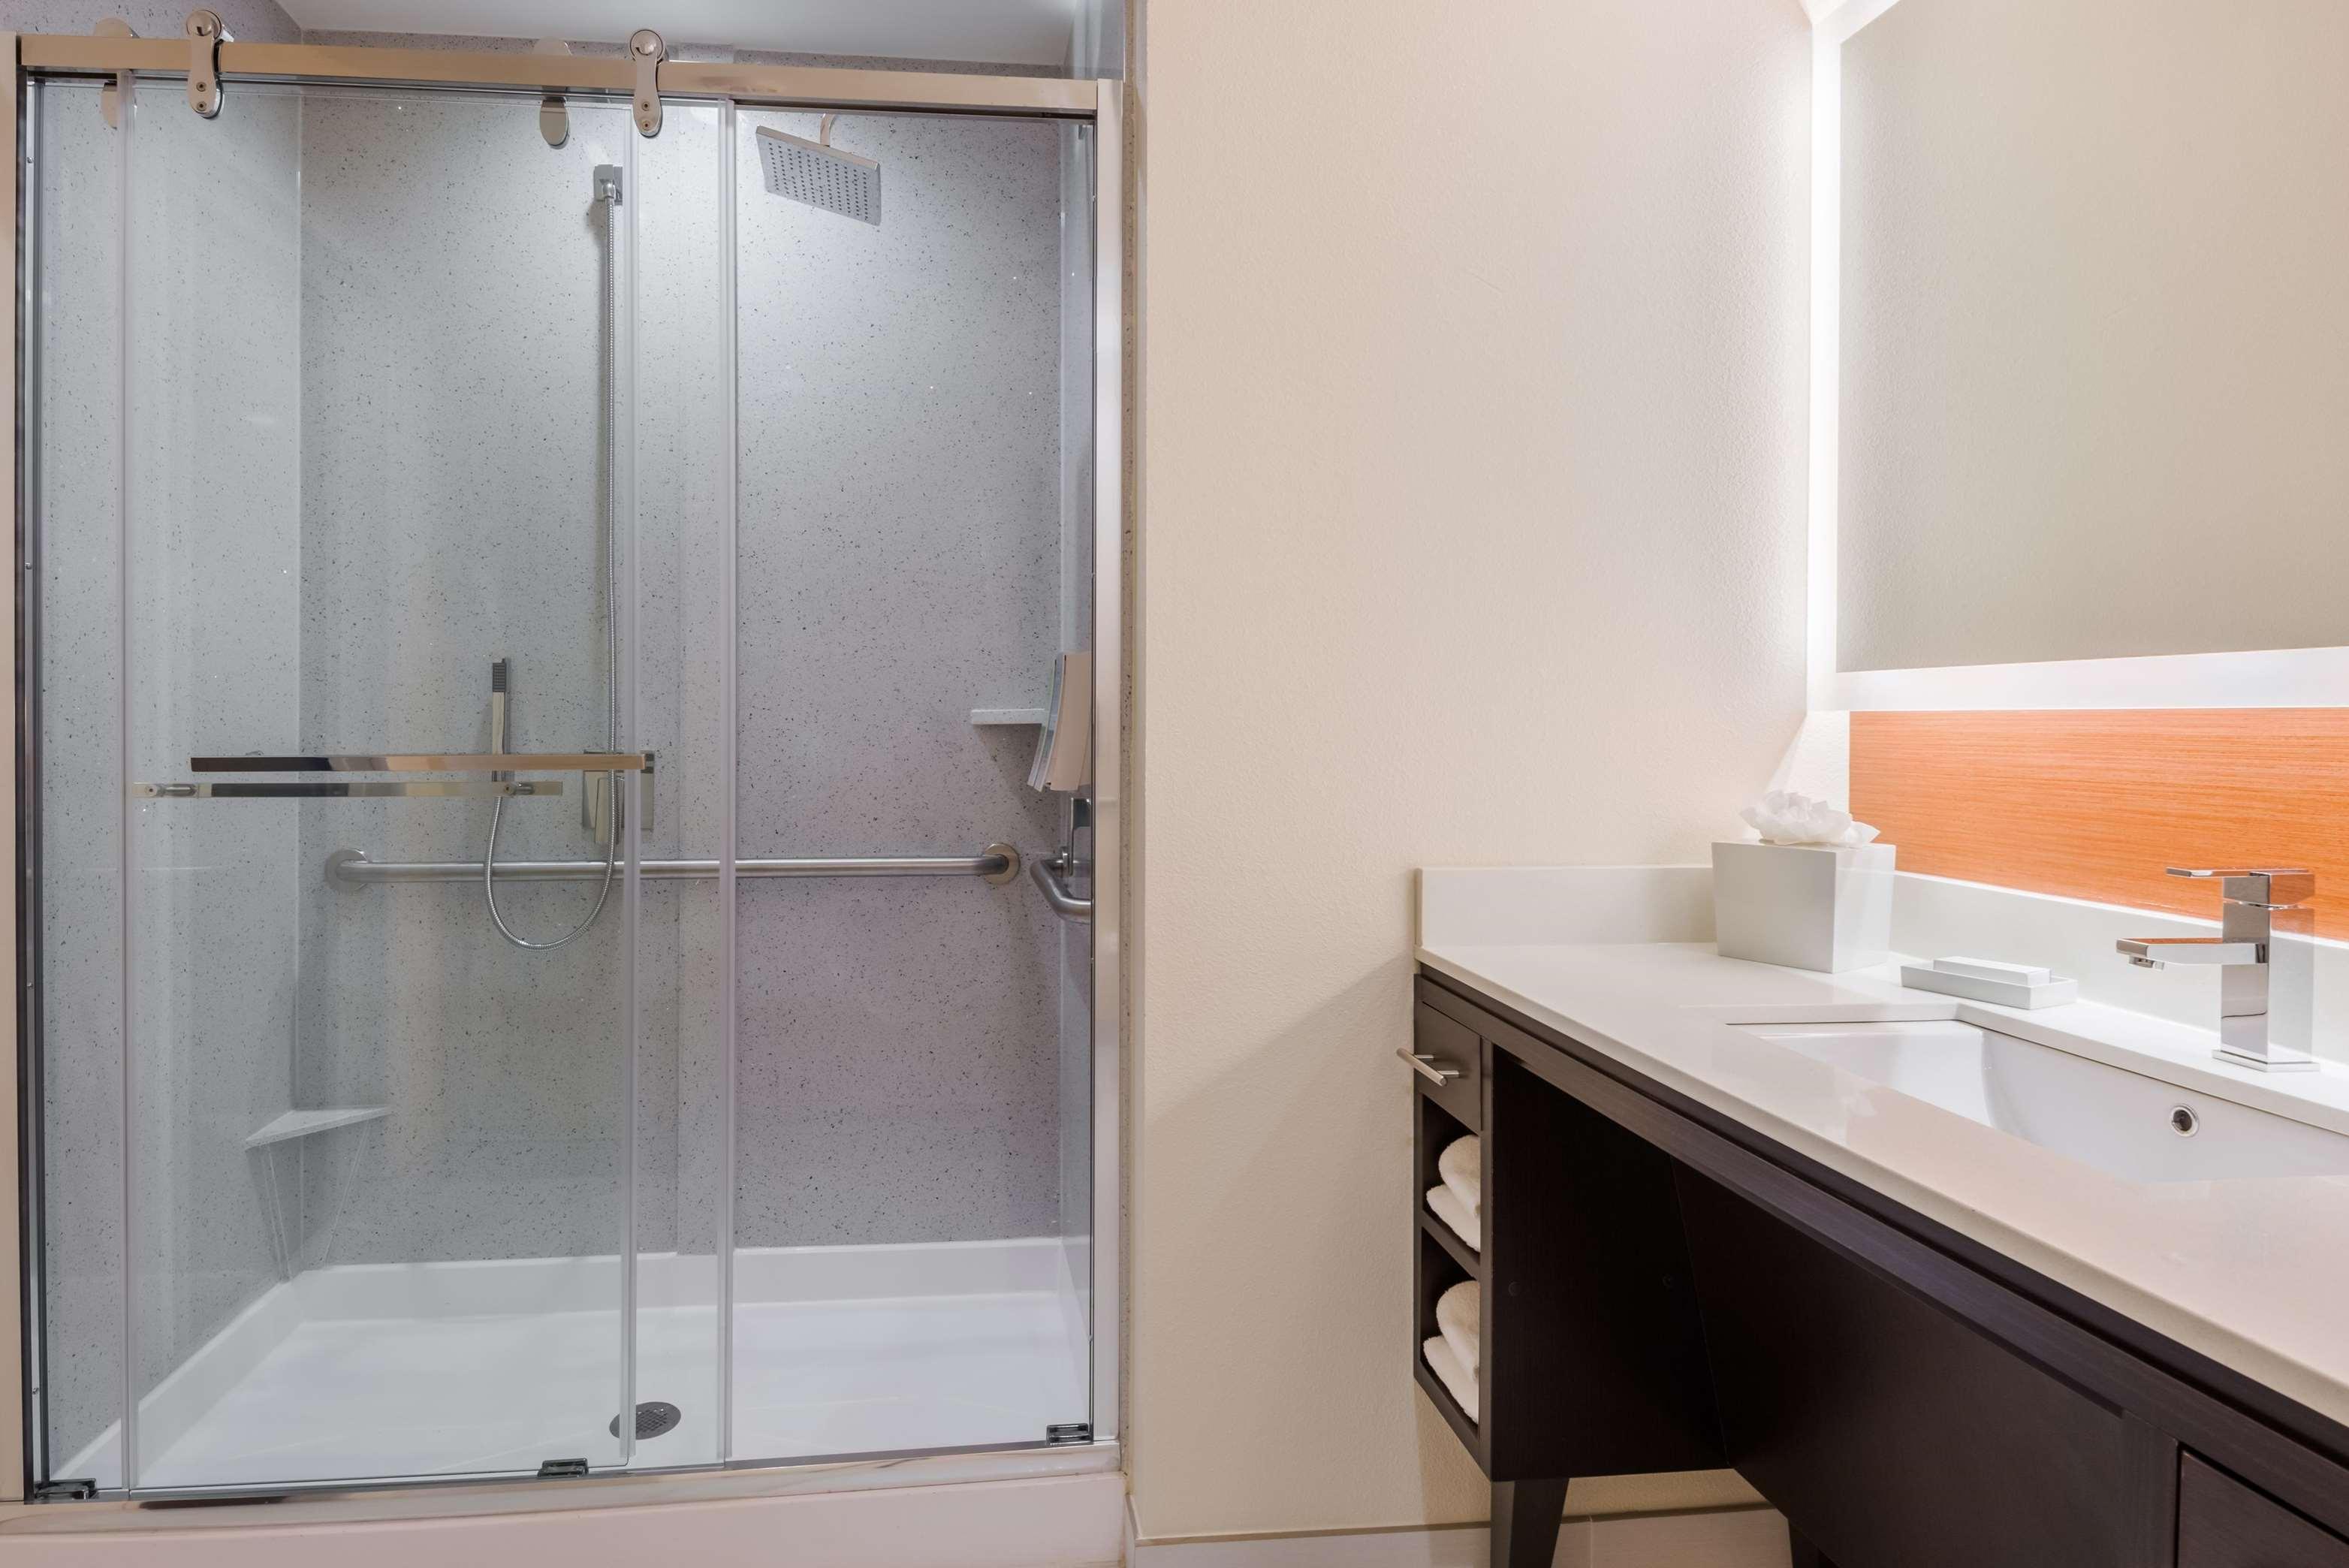 Home2 Suites by Hilton Atlanta Downtown image 9